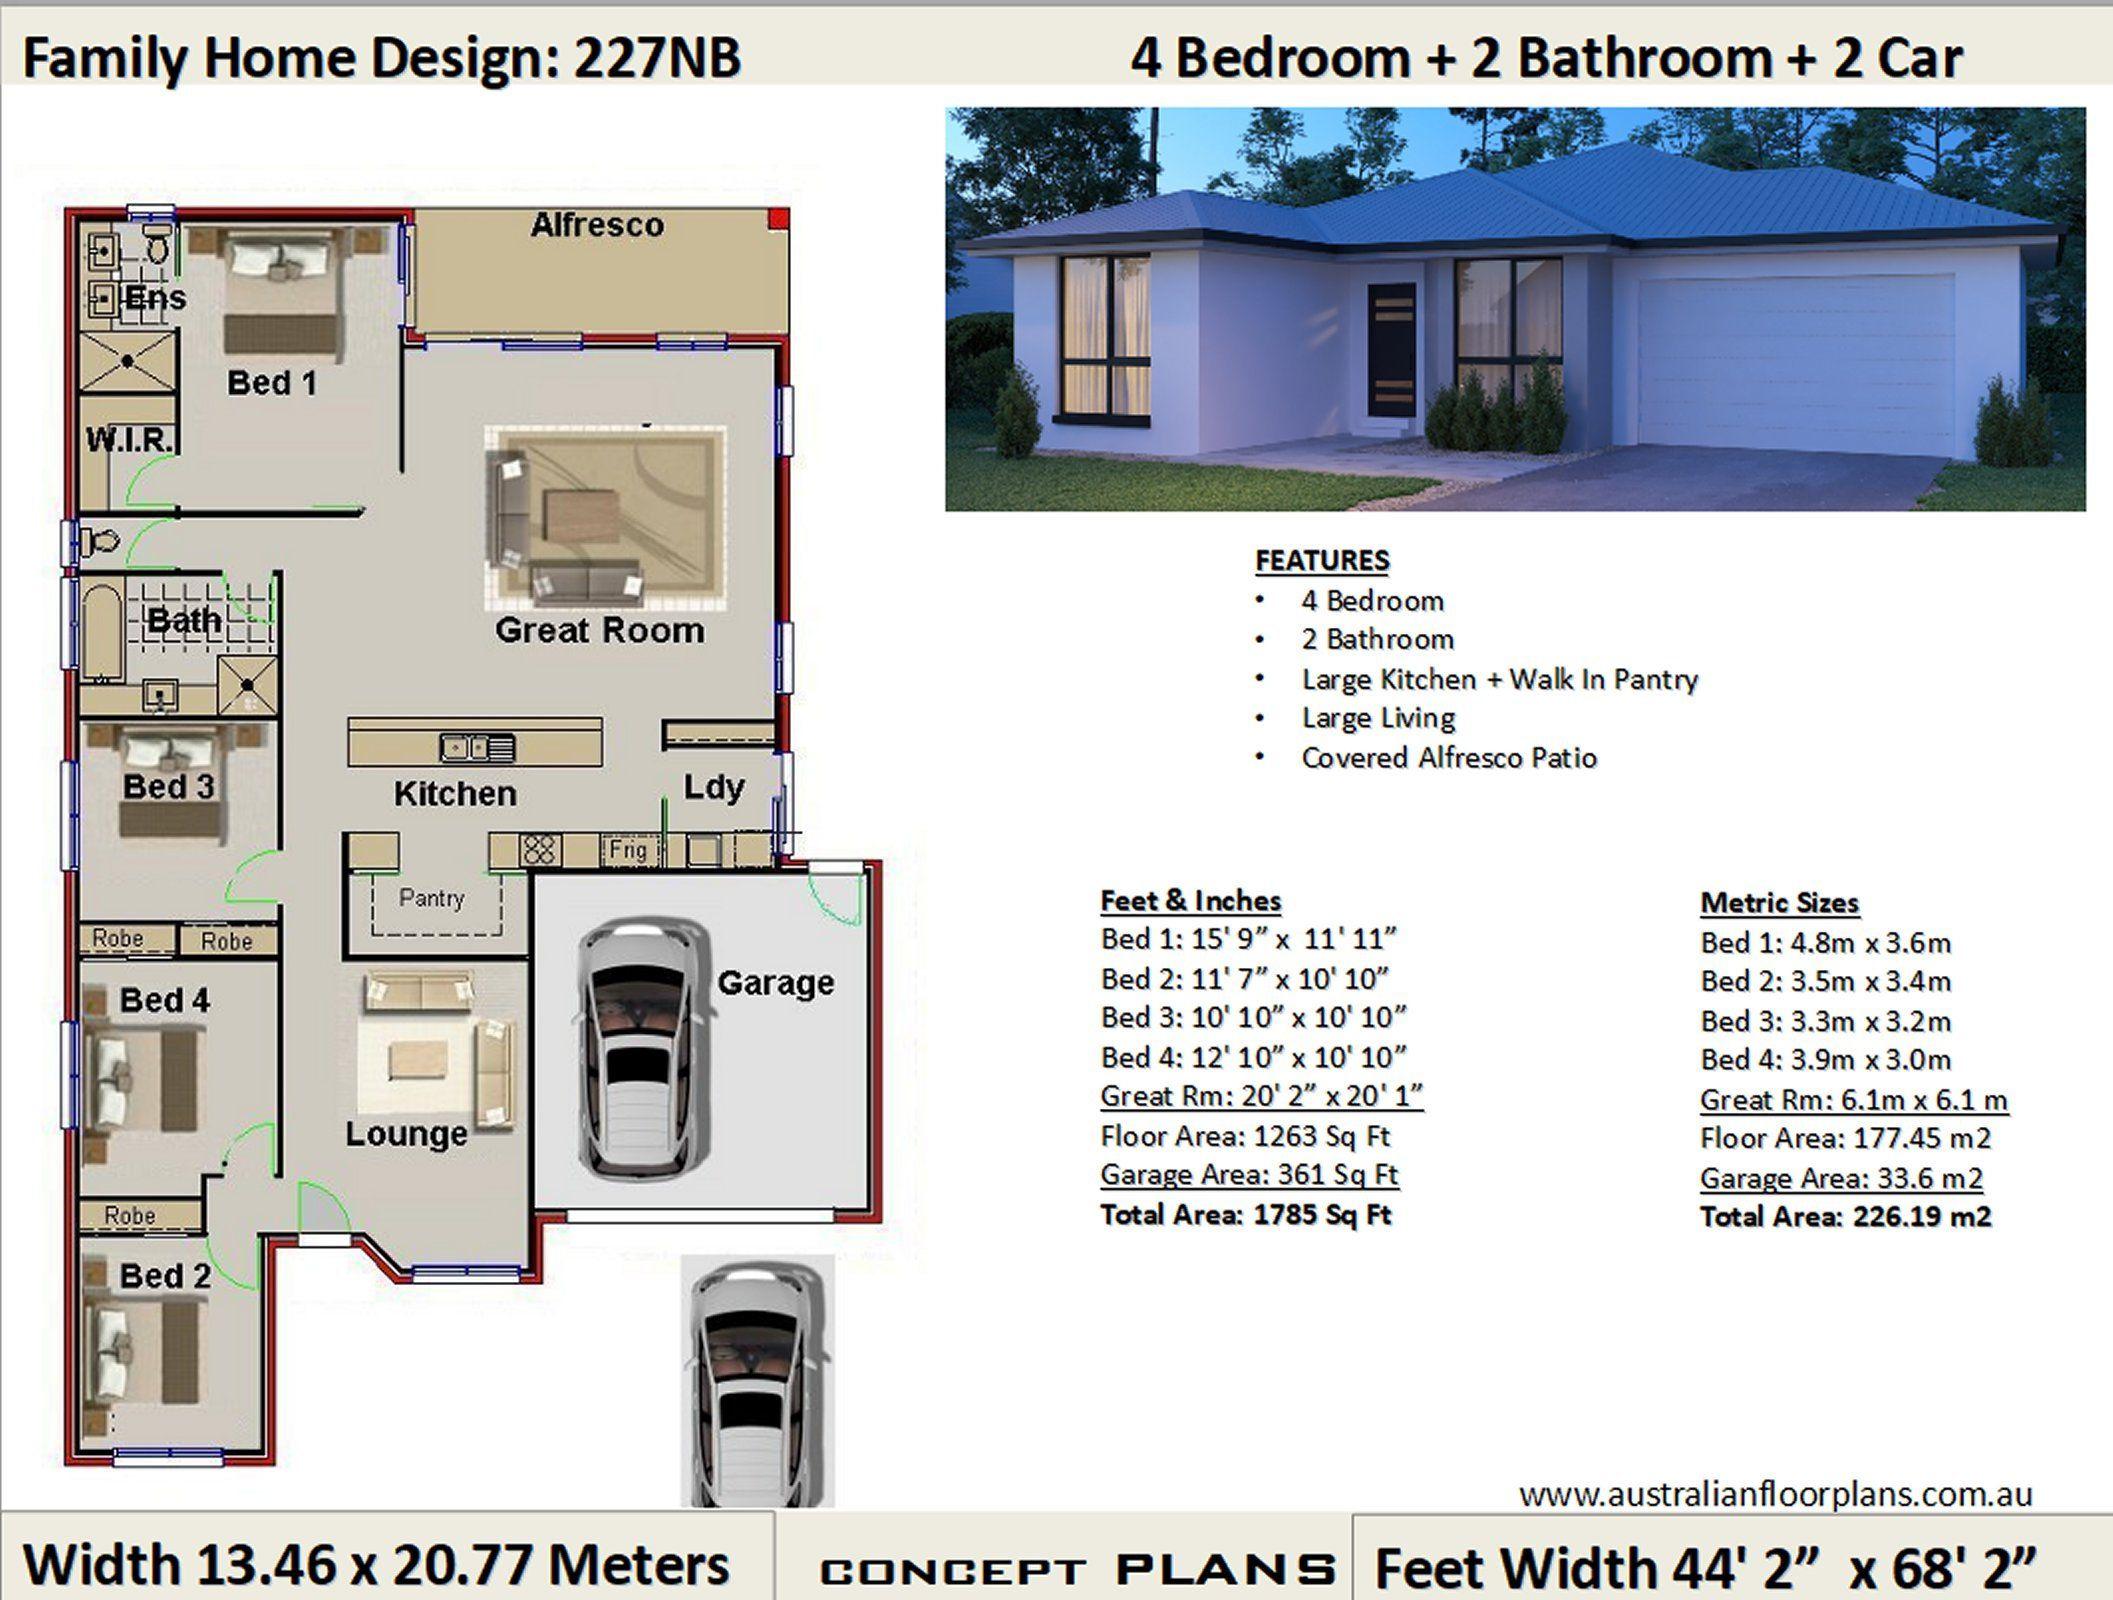 House Plans 4 Bedroom House Plans Double Garage Home Etsy In 2020 Bedroom House Plans House Plans 4 Bedroom House Plans